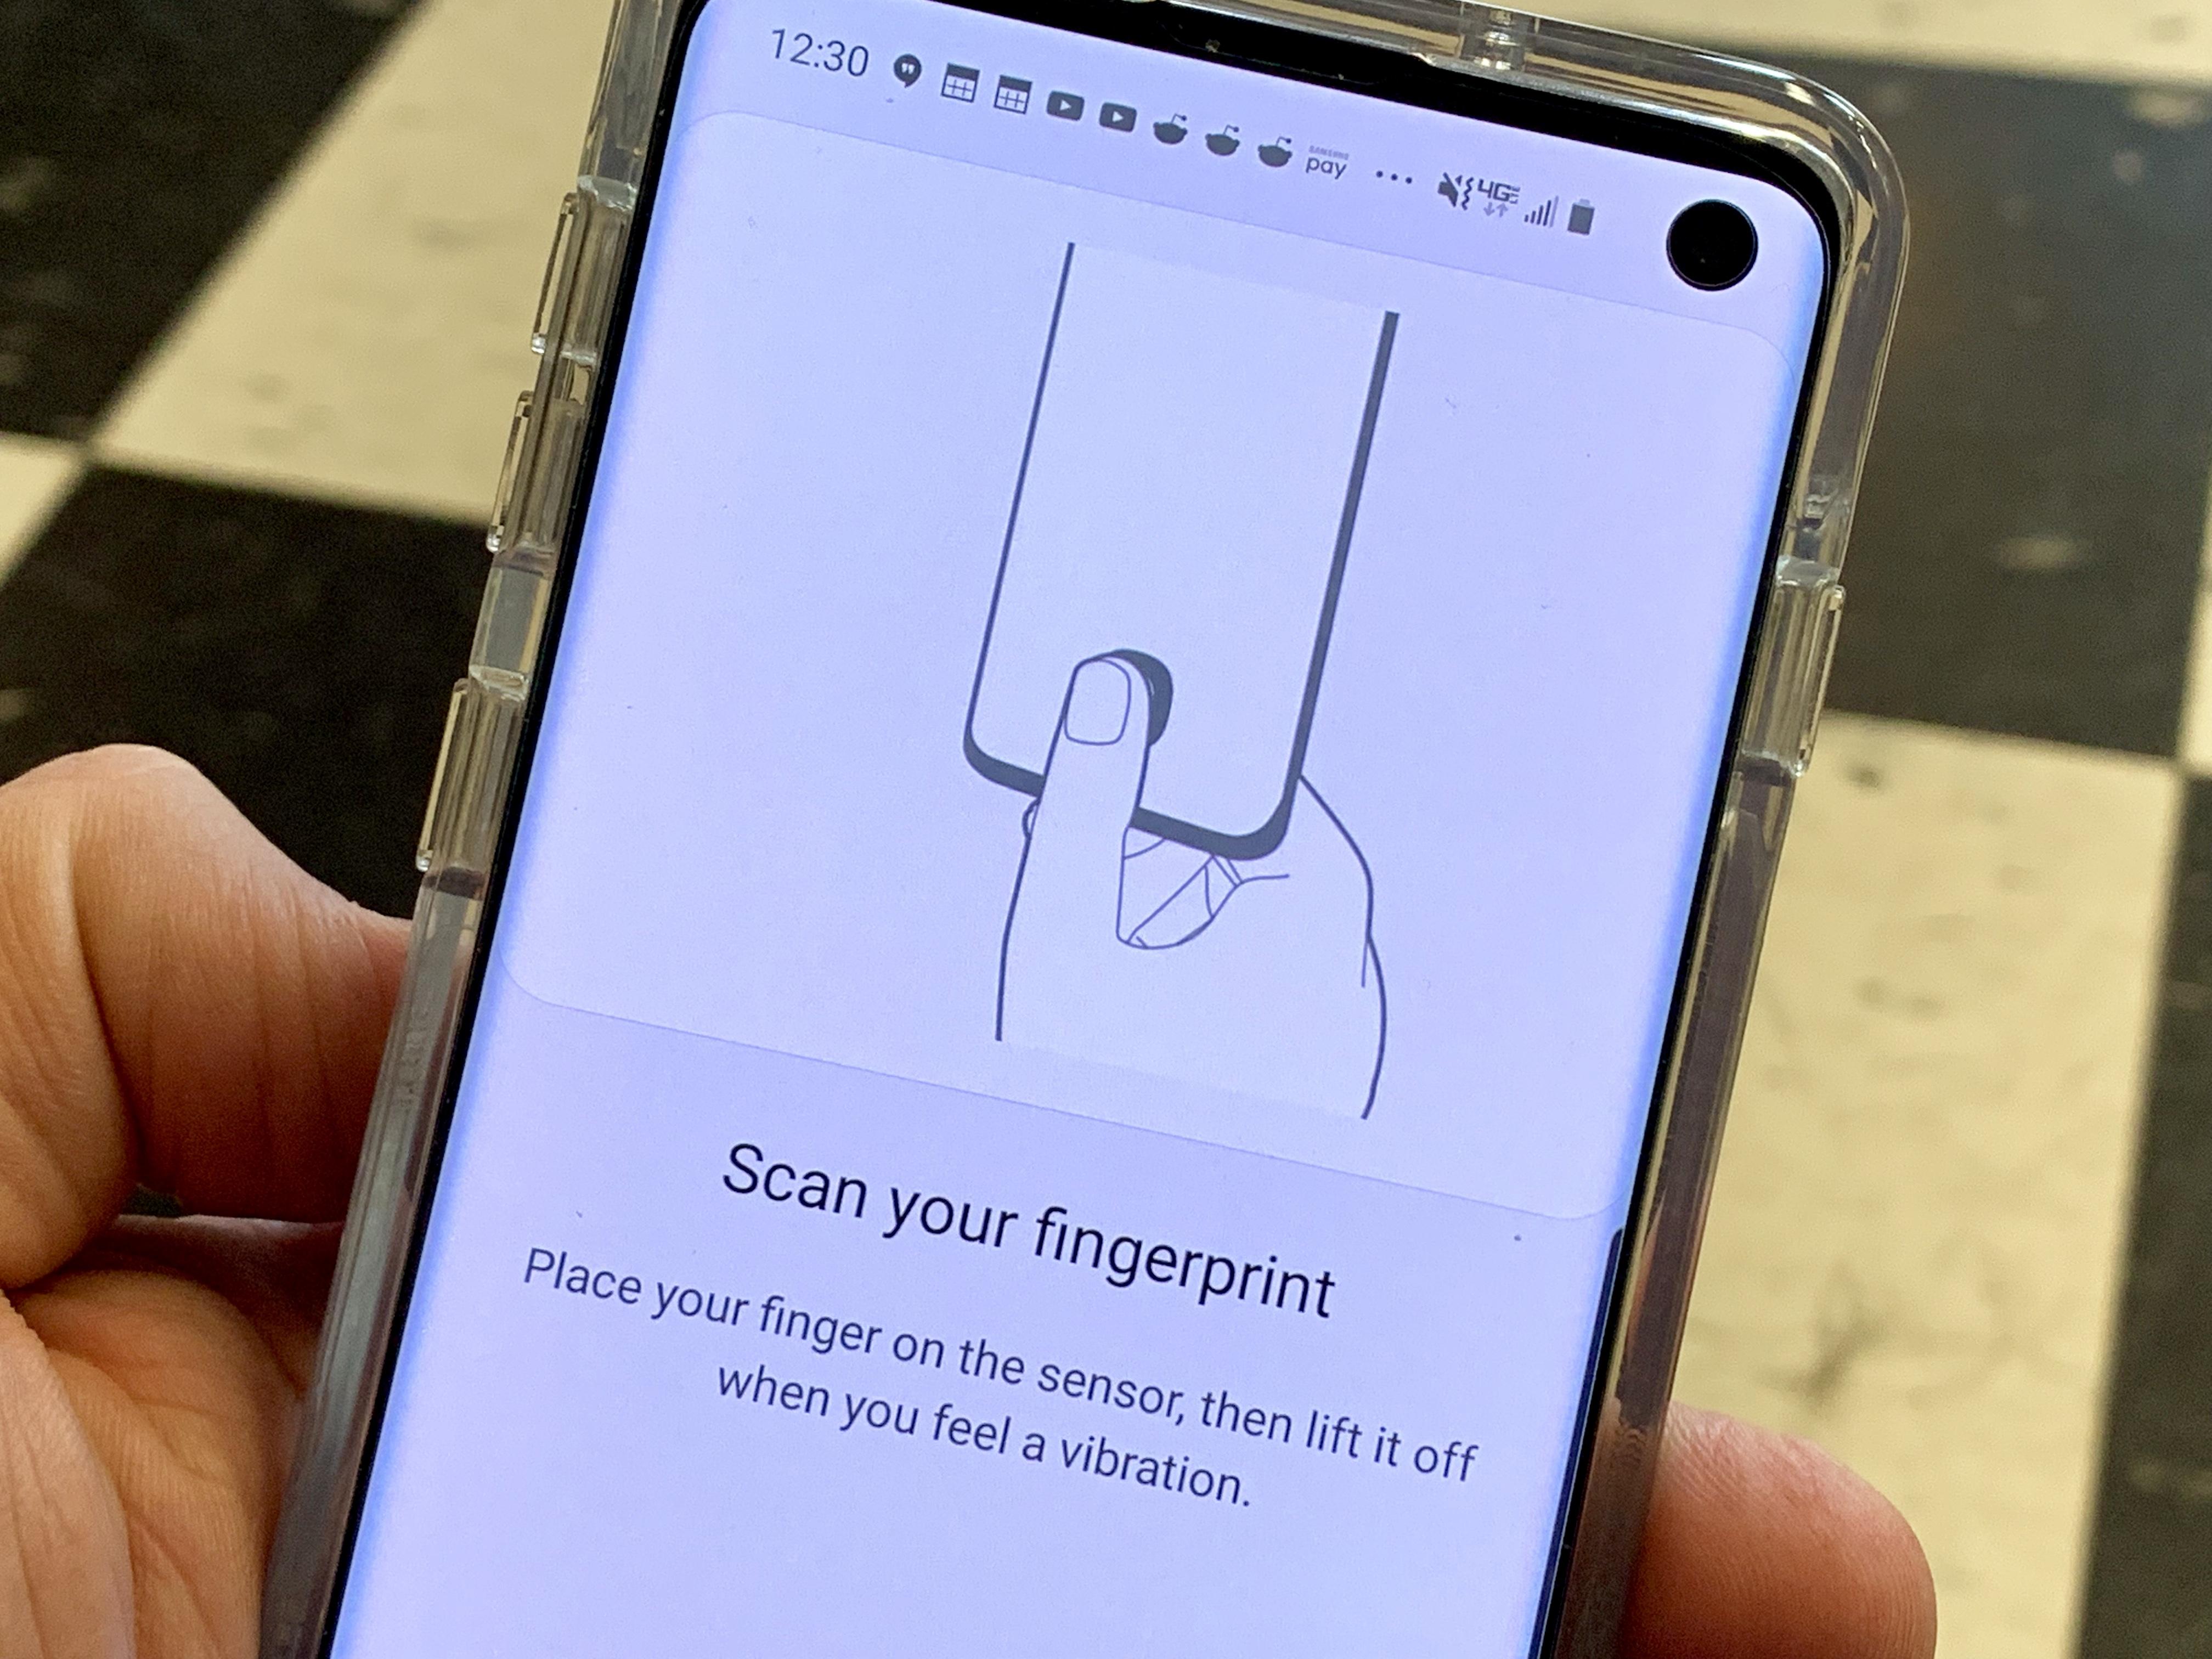 Train your fingerprints the right way.